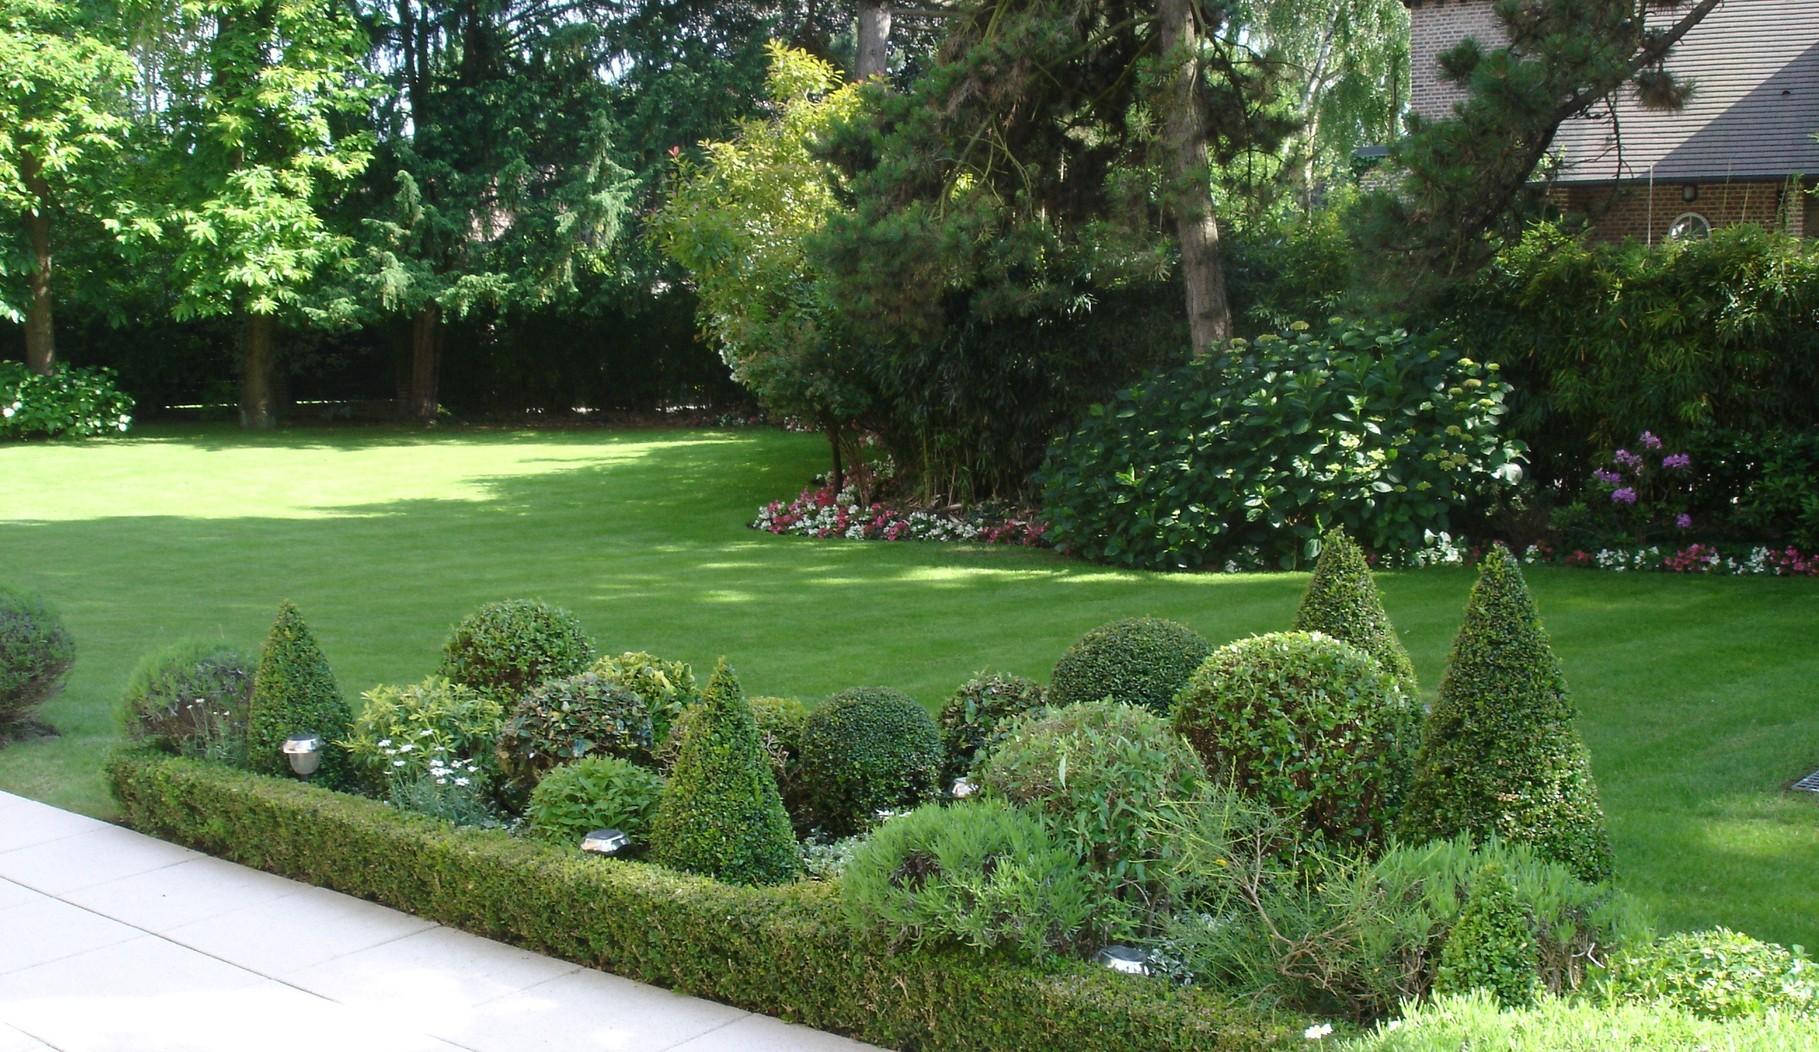 Paysagiste jardi proxi bondues entretien de jardins for Entretien jardin 86